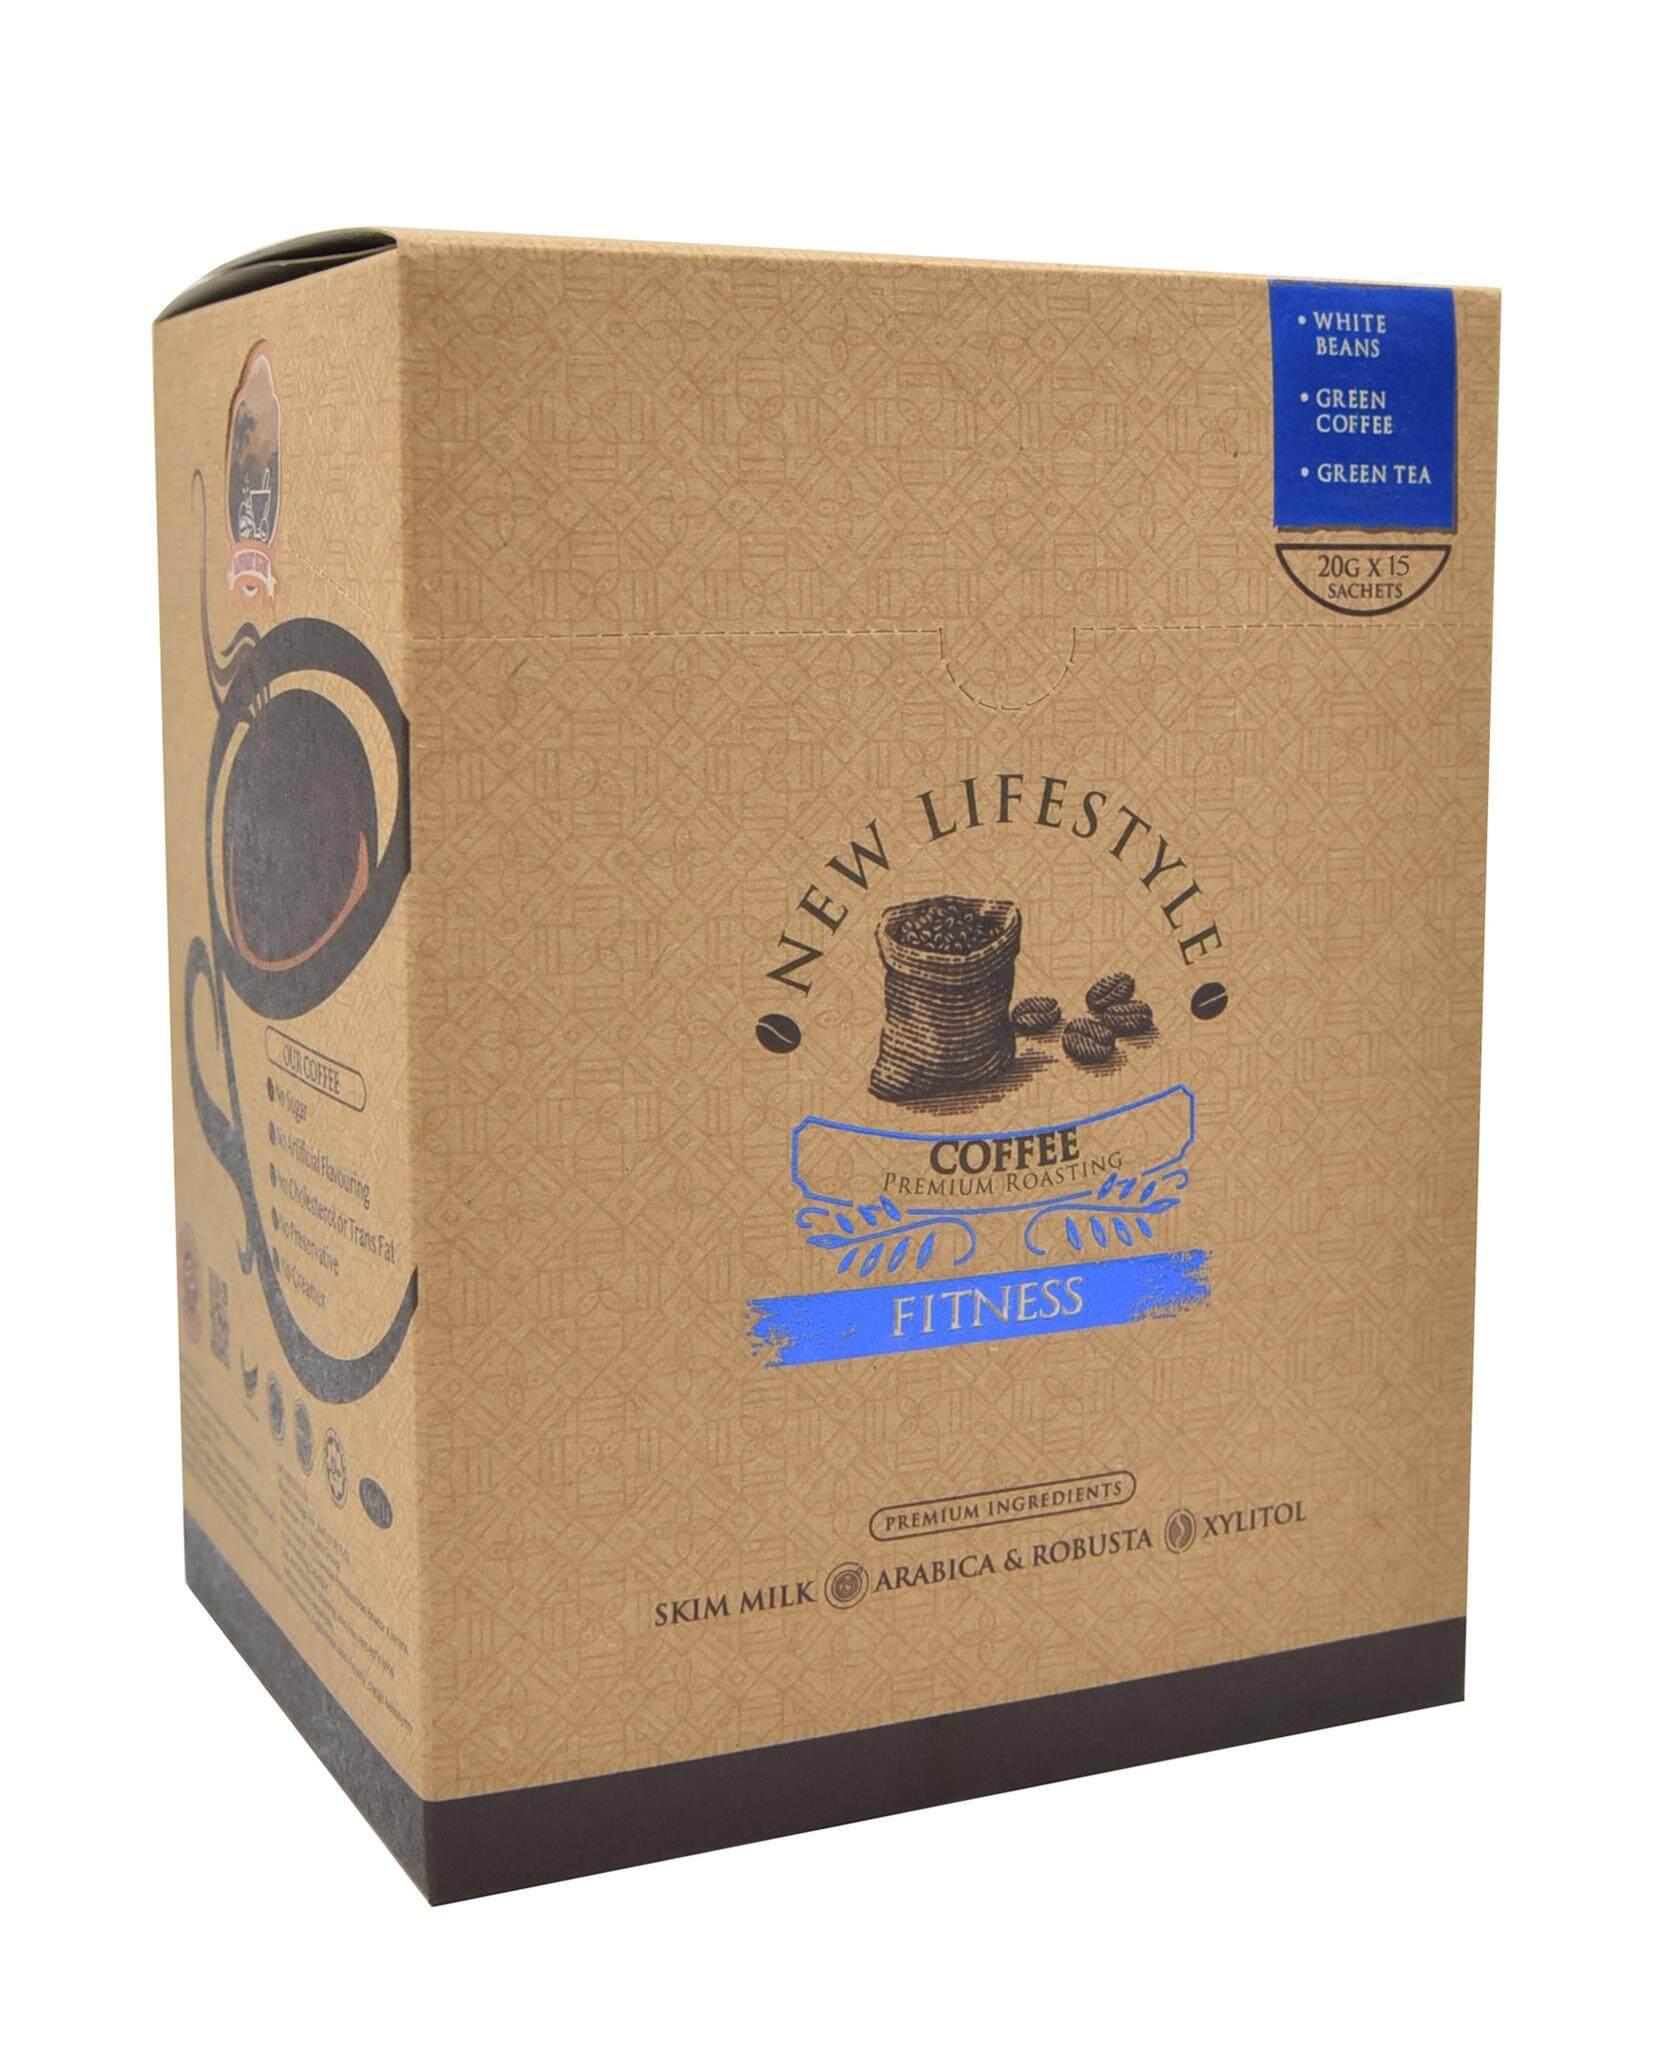 New Lifestyle Coffee - Fitness